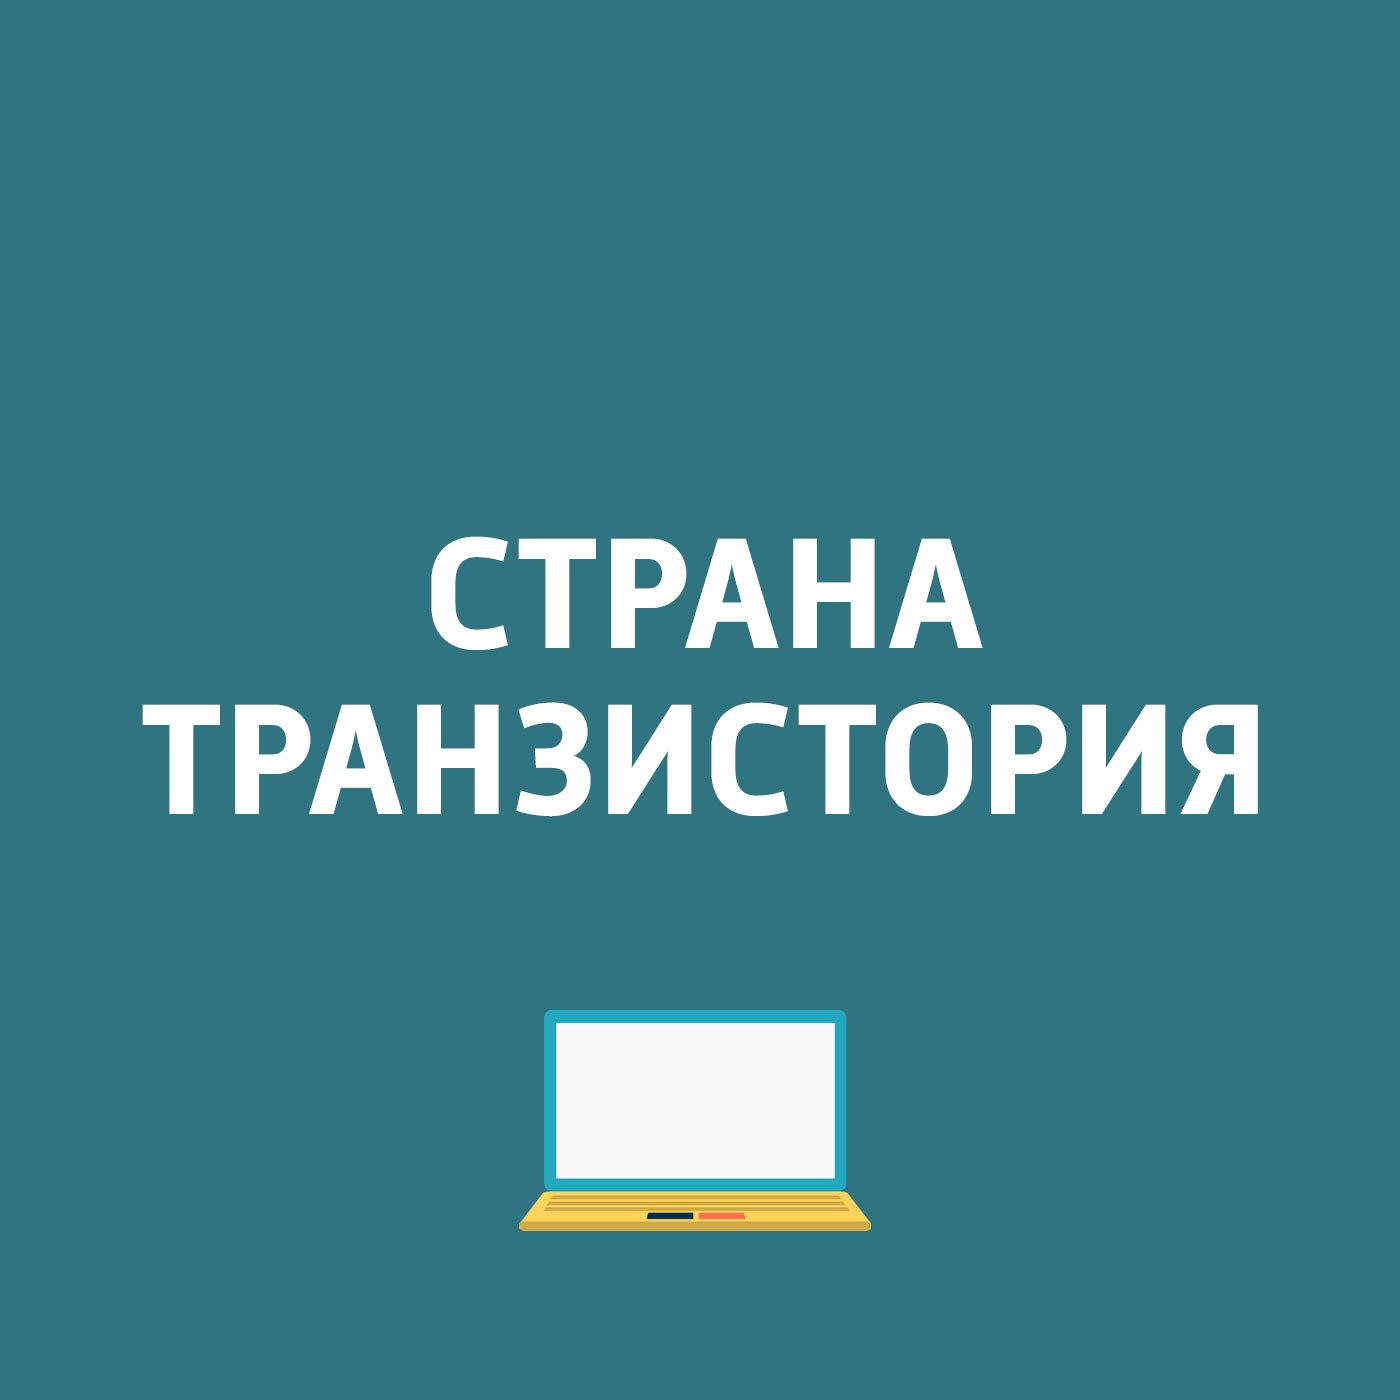 Картаев Павел Xiaomi: Redmi 4X, Mi Note 2 и Mi Mix картаев павел xiaomi redmi 4x mi note 2 и mi mix